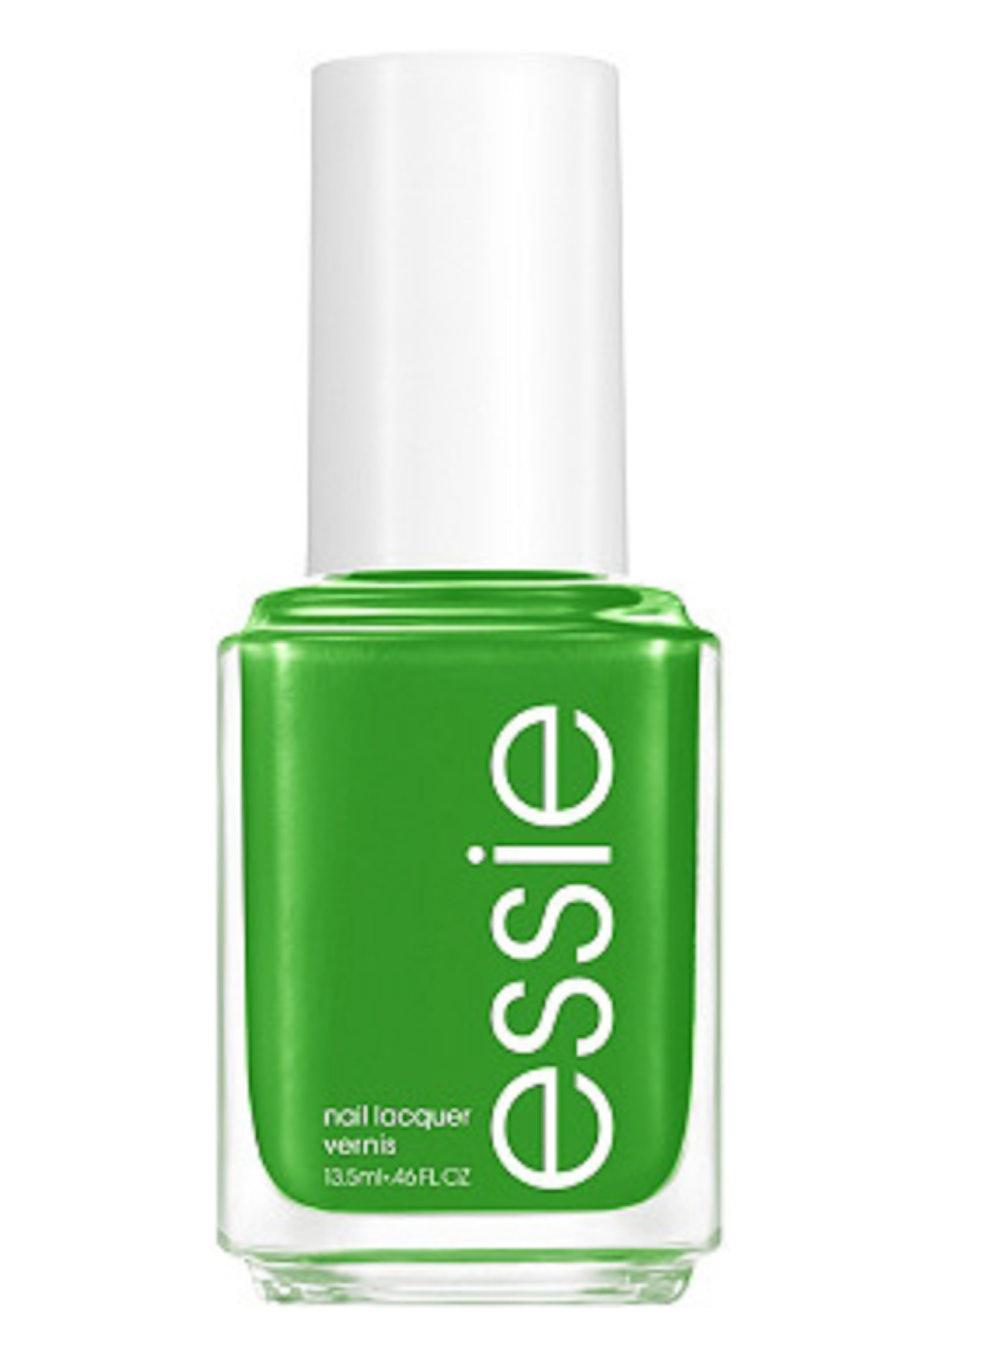 Essie Limited Edition Summer 2021 Collection